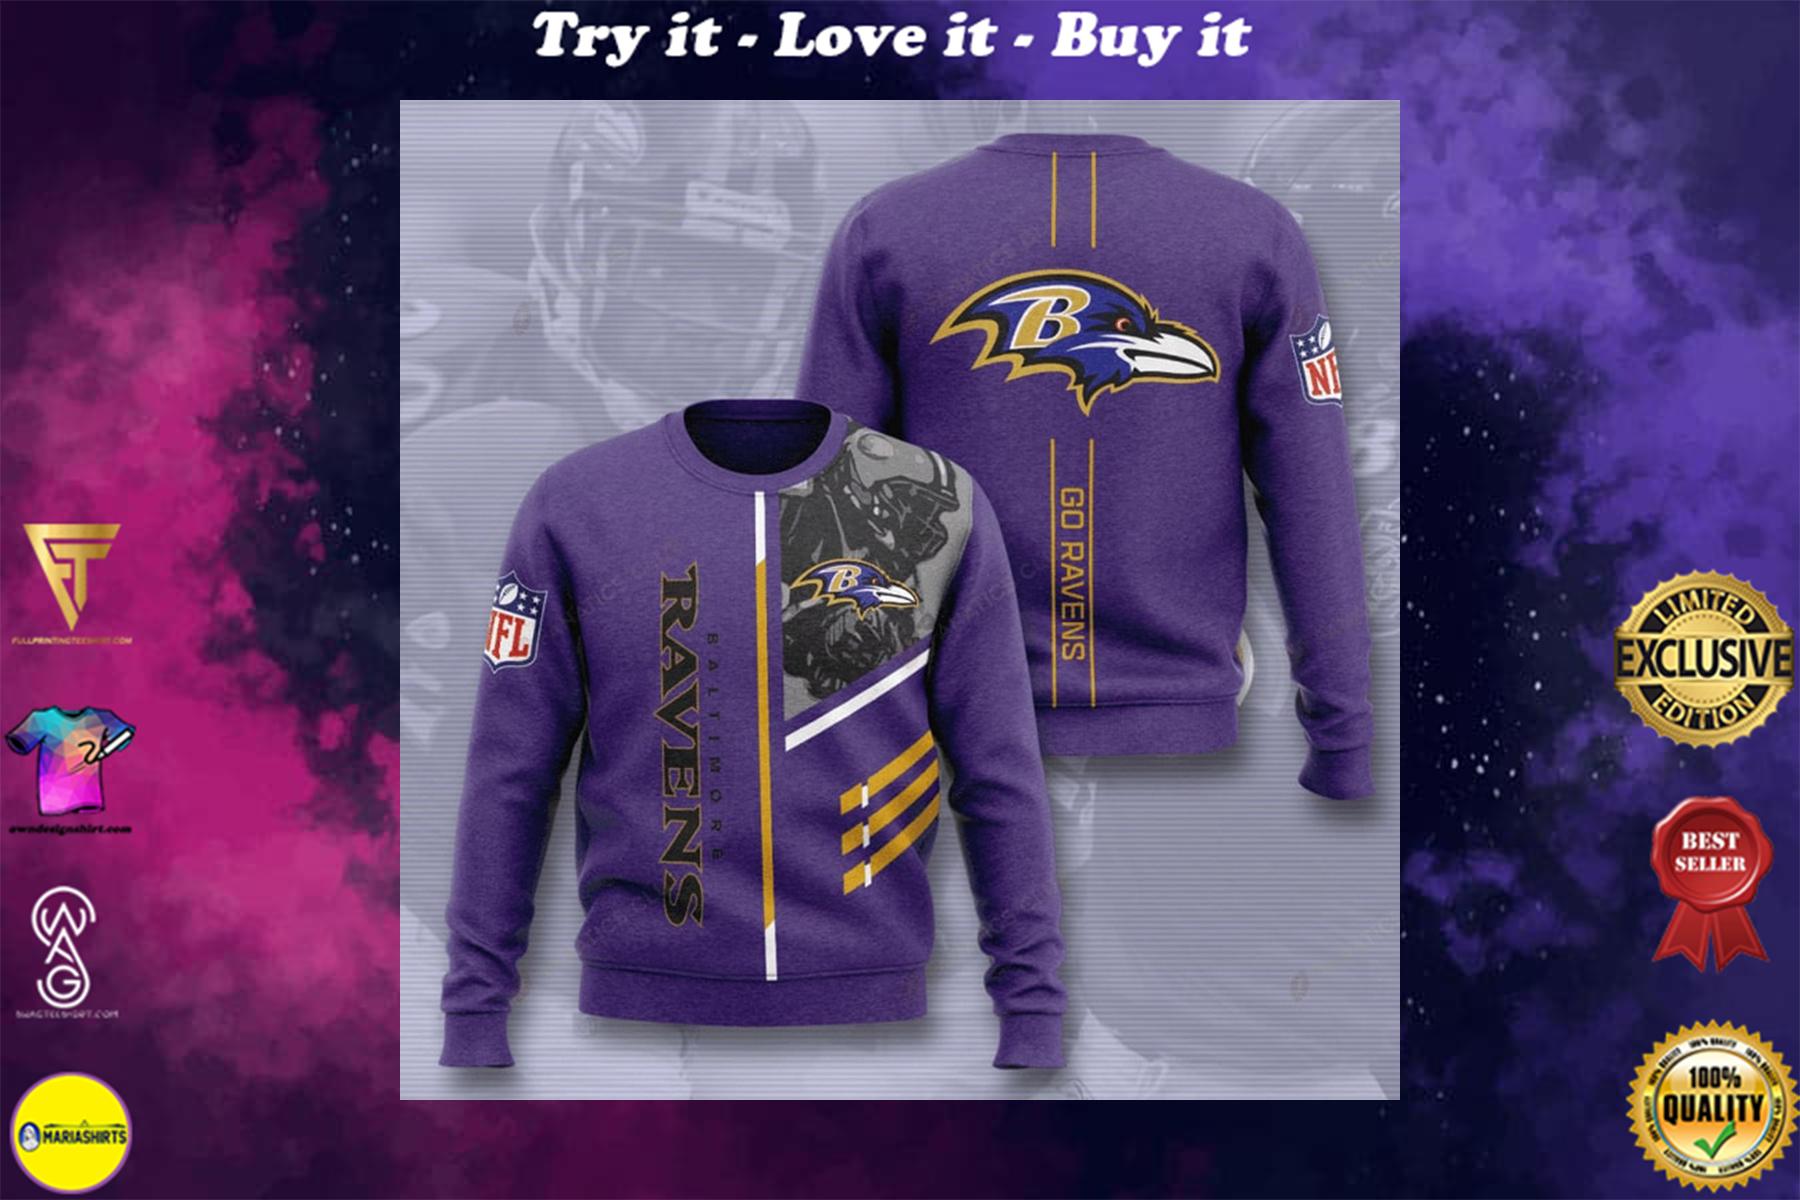 [highest selling] baltimore ravens go ravens full printing ugly sweater - maria